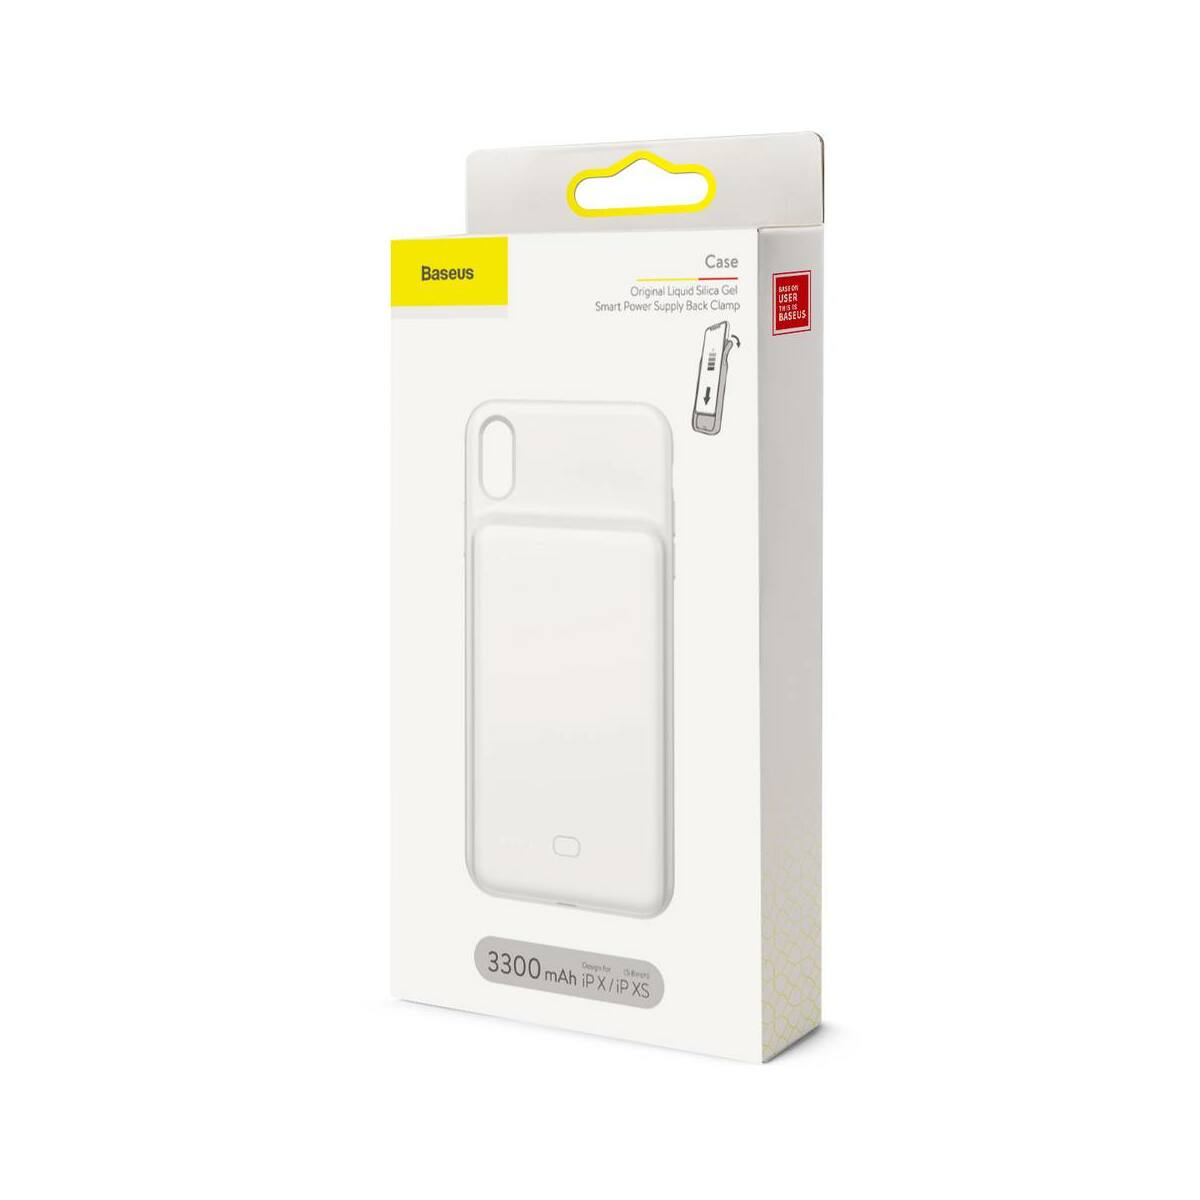 Baseus Power Bank tok, Liquid Silicone Smart back clamp 3300 mAh, X/XS, fehér (ACAPIPH58-ABJ02)